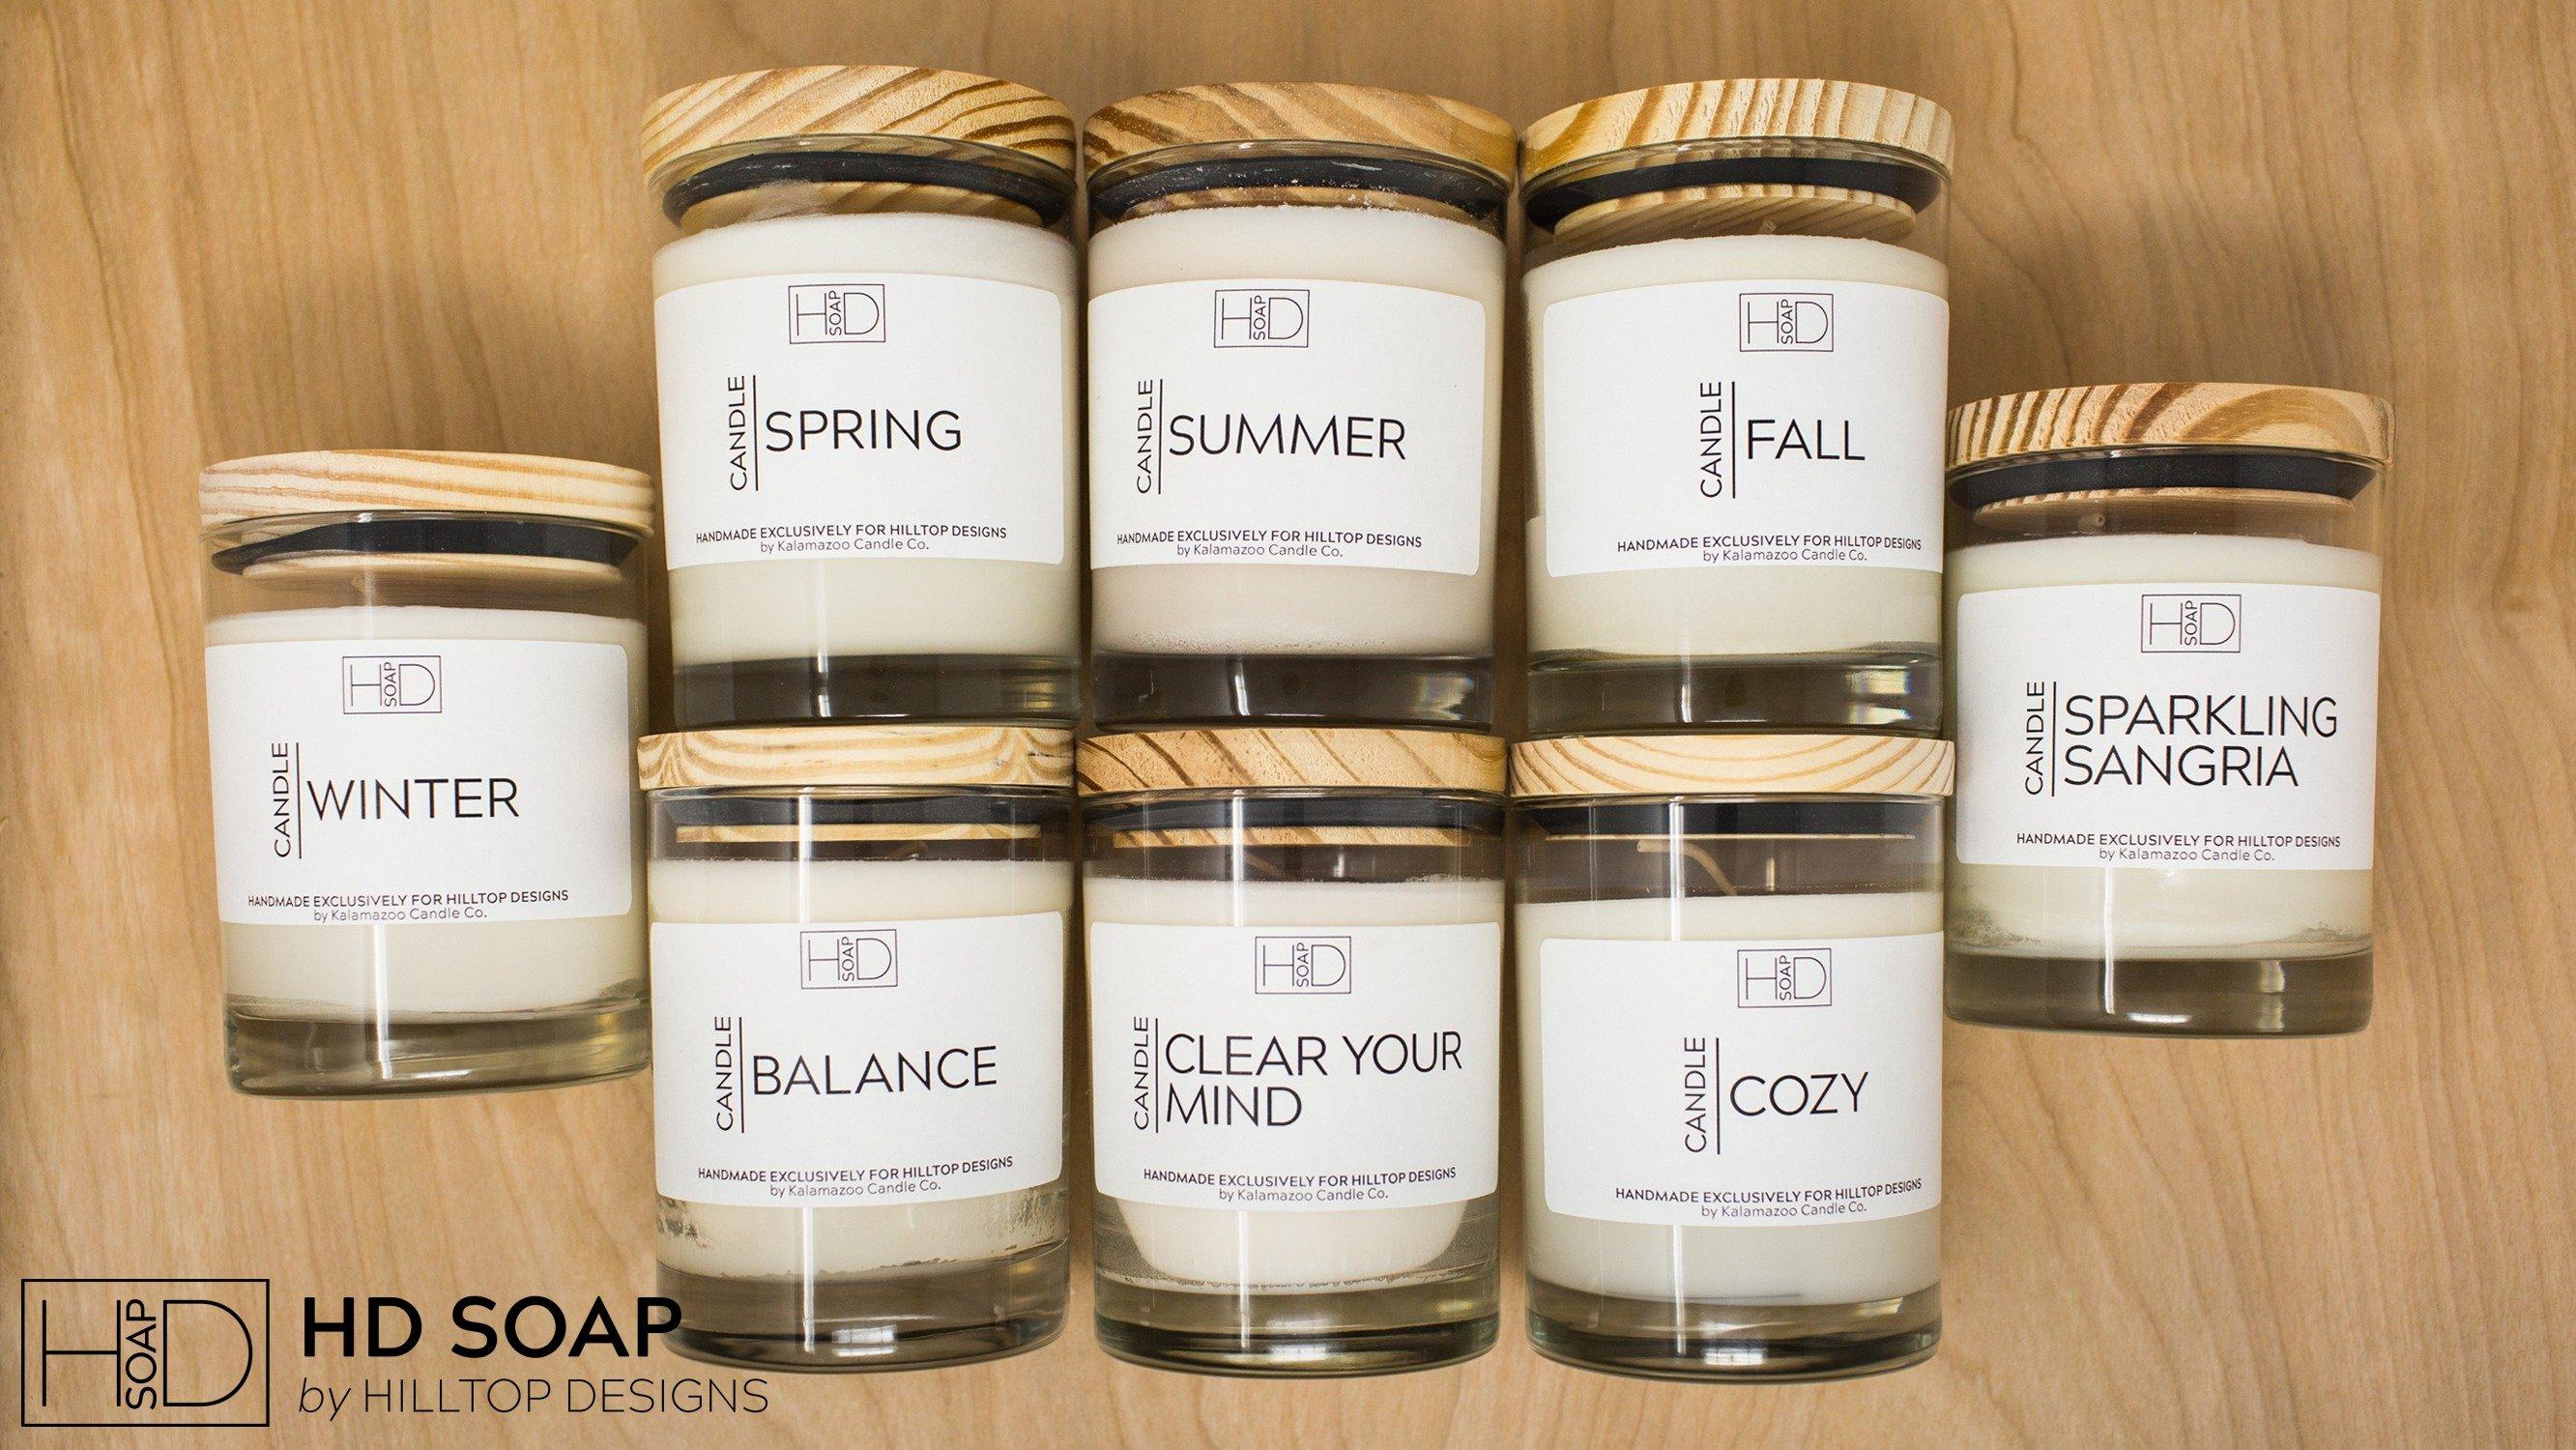 HD Soap | Kalamazoo Candle Company Anniversary